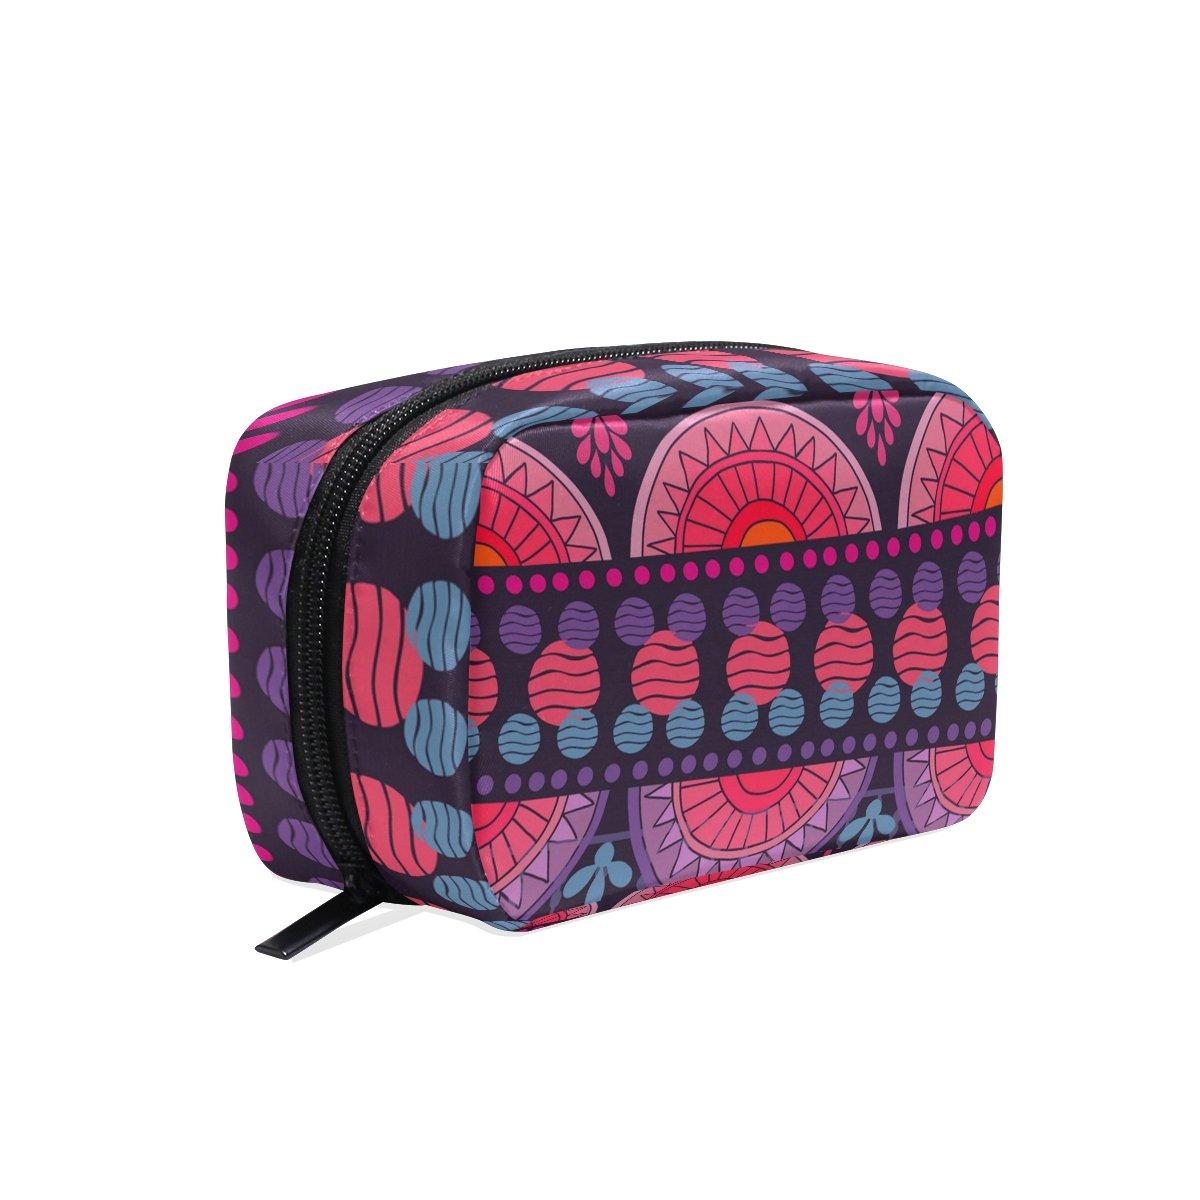 OREZI Toiletry Bag for women Girl Bright Purple Stripe Cosmetic Bag Portable Travel Makeup Bag Organizer